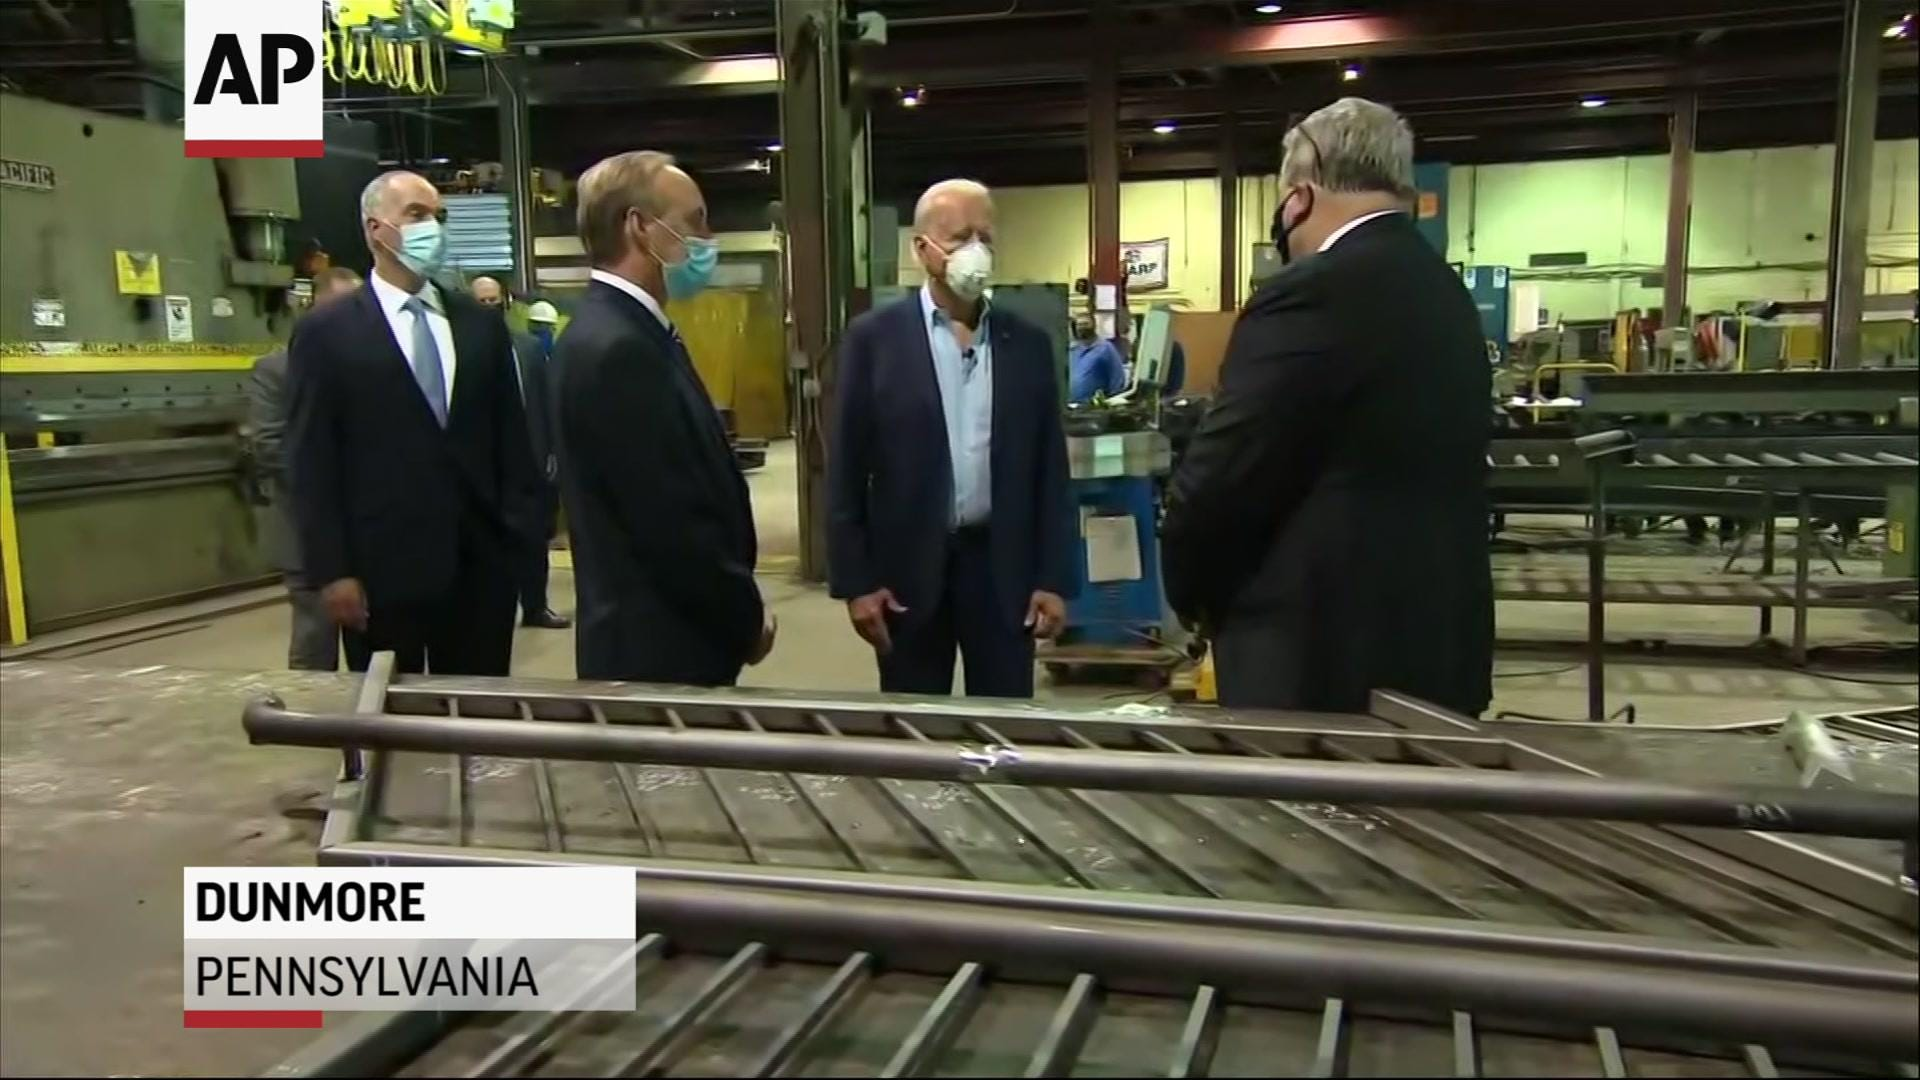 Covid disruptions, Trump Tariffs make U.S. manufacturers pine for home